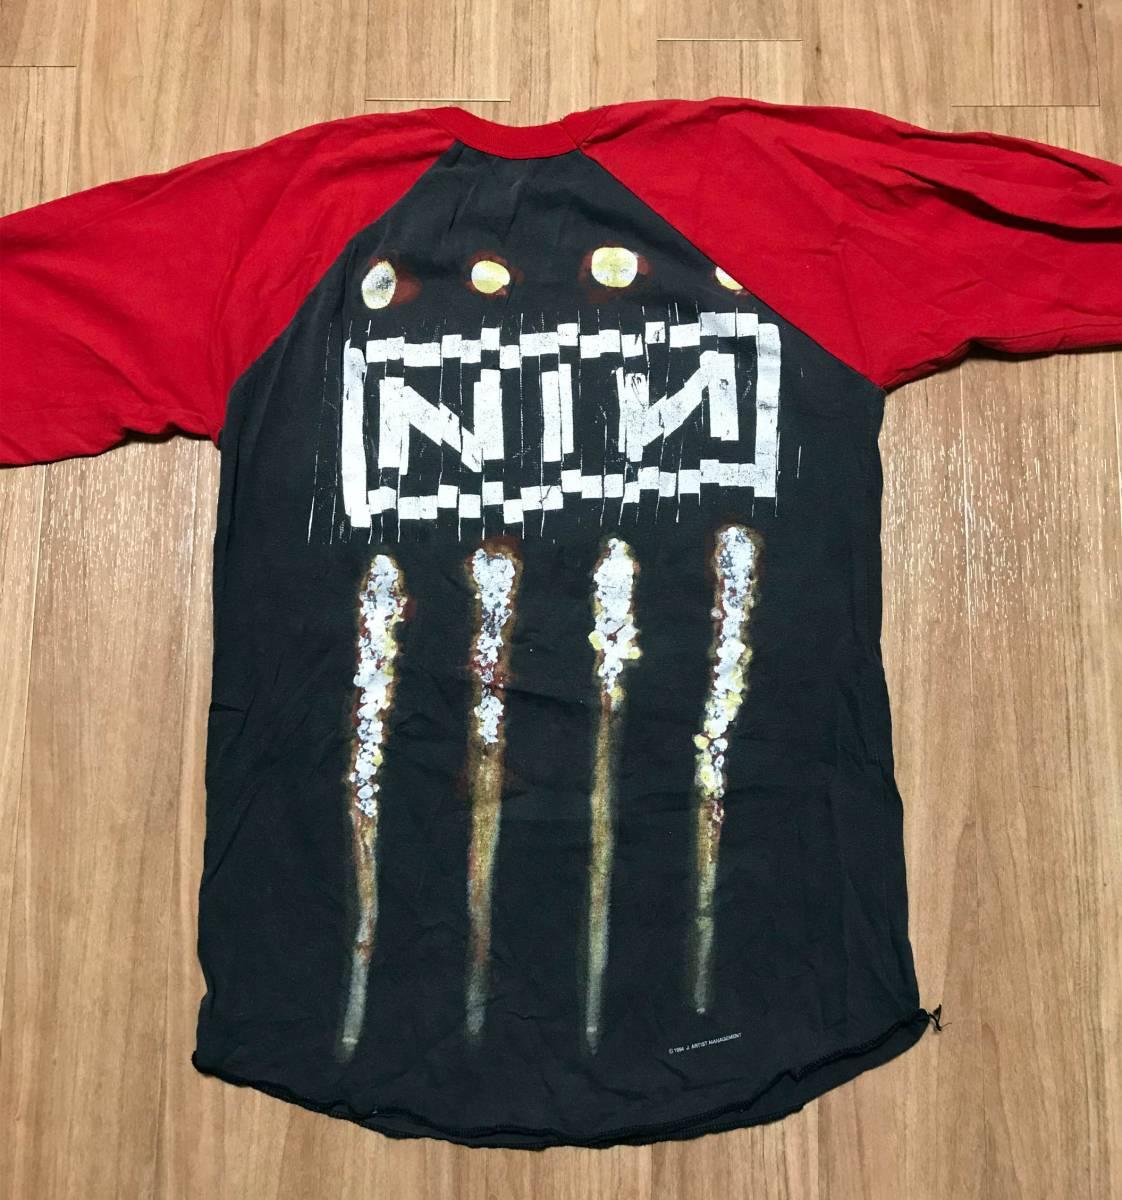 Nine Inch Nails Tシャツ Downward Spiral カニエウェスト nirvana Fear of god Travis Scott Jerry Lorenzo supreme